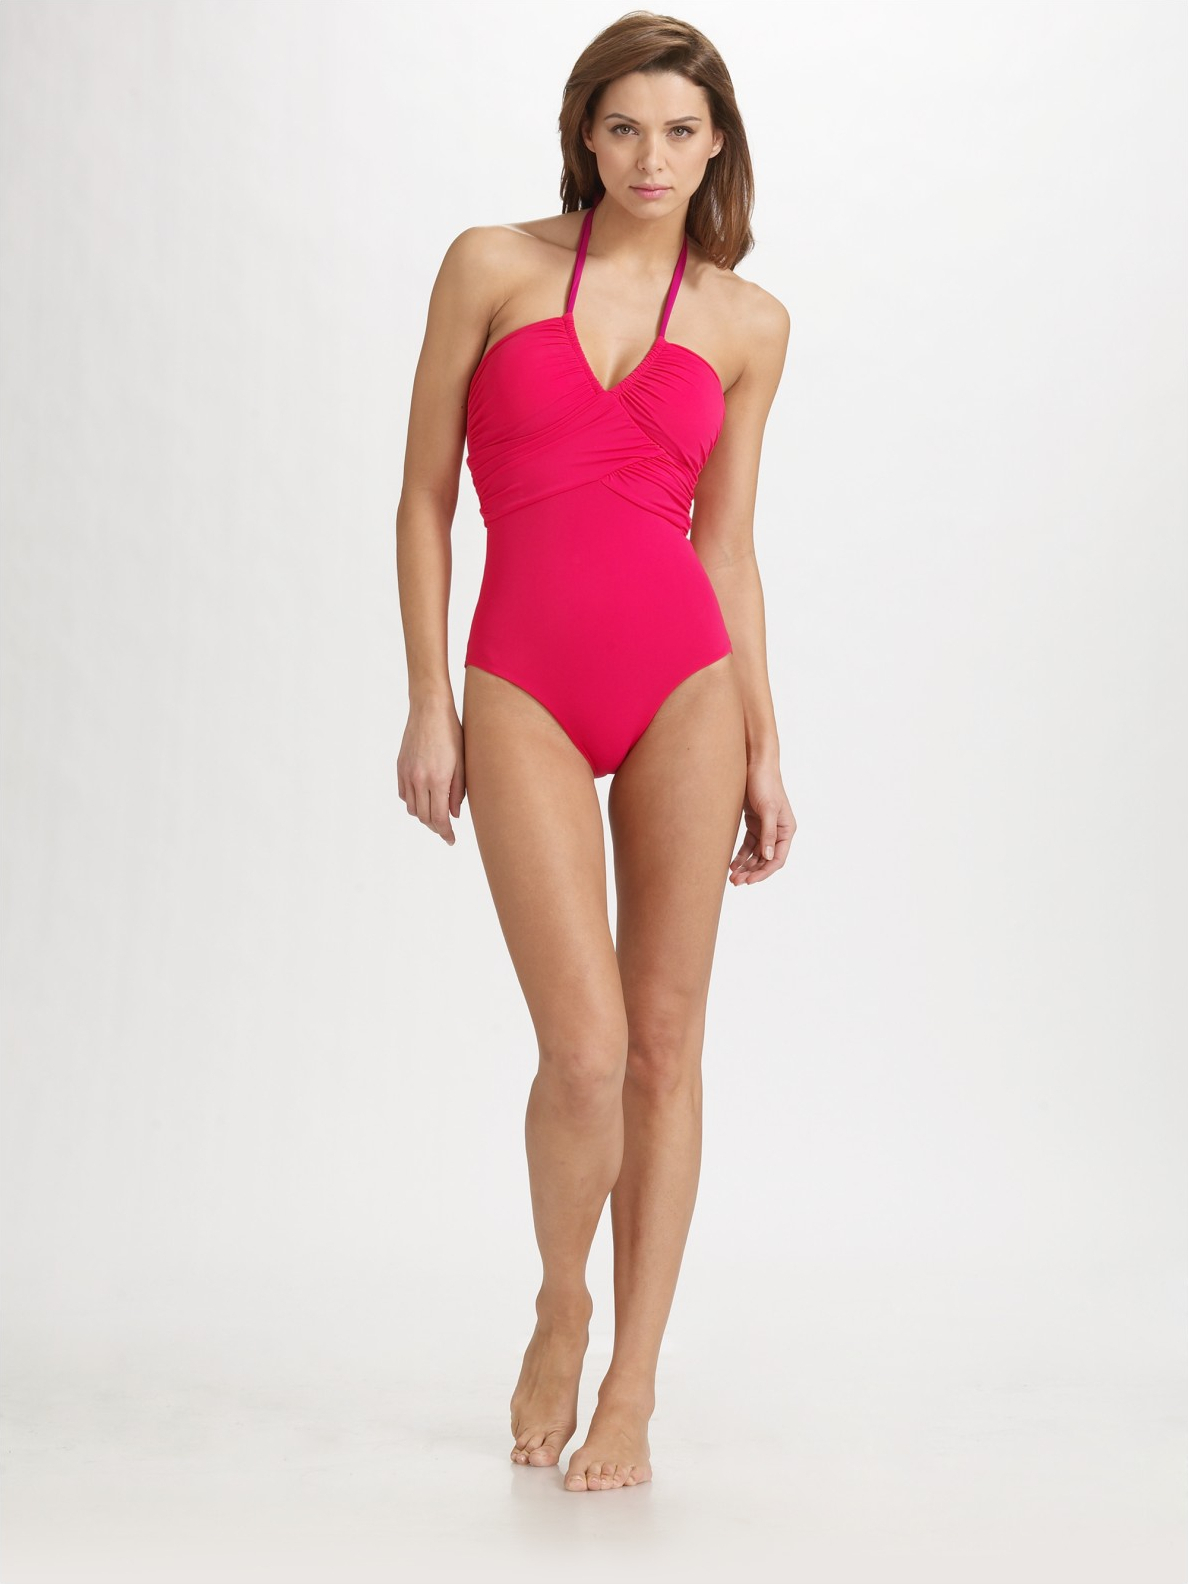 Vera Farmiga Images Bikini Related Keywords & Suggestions - Vera ... Thedeparted